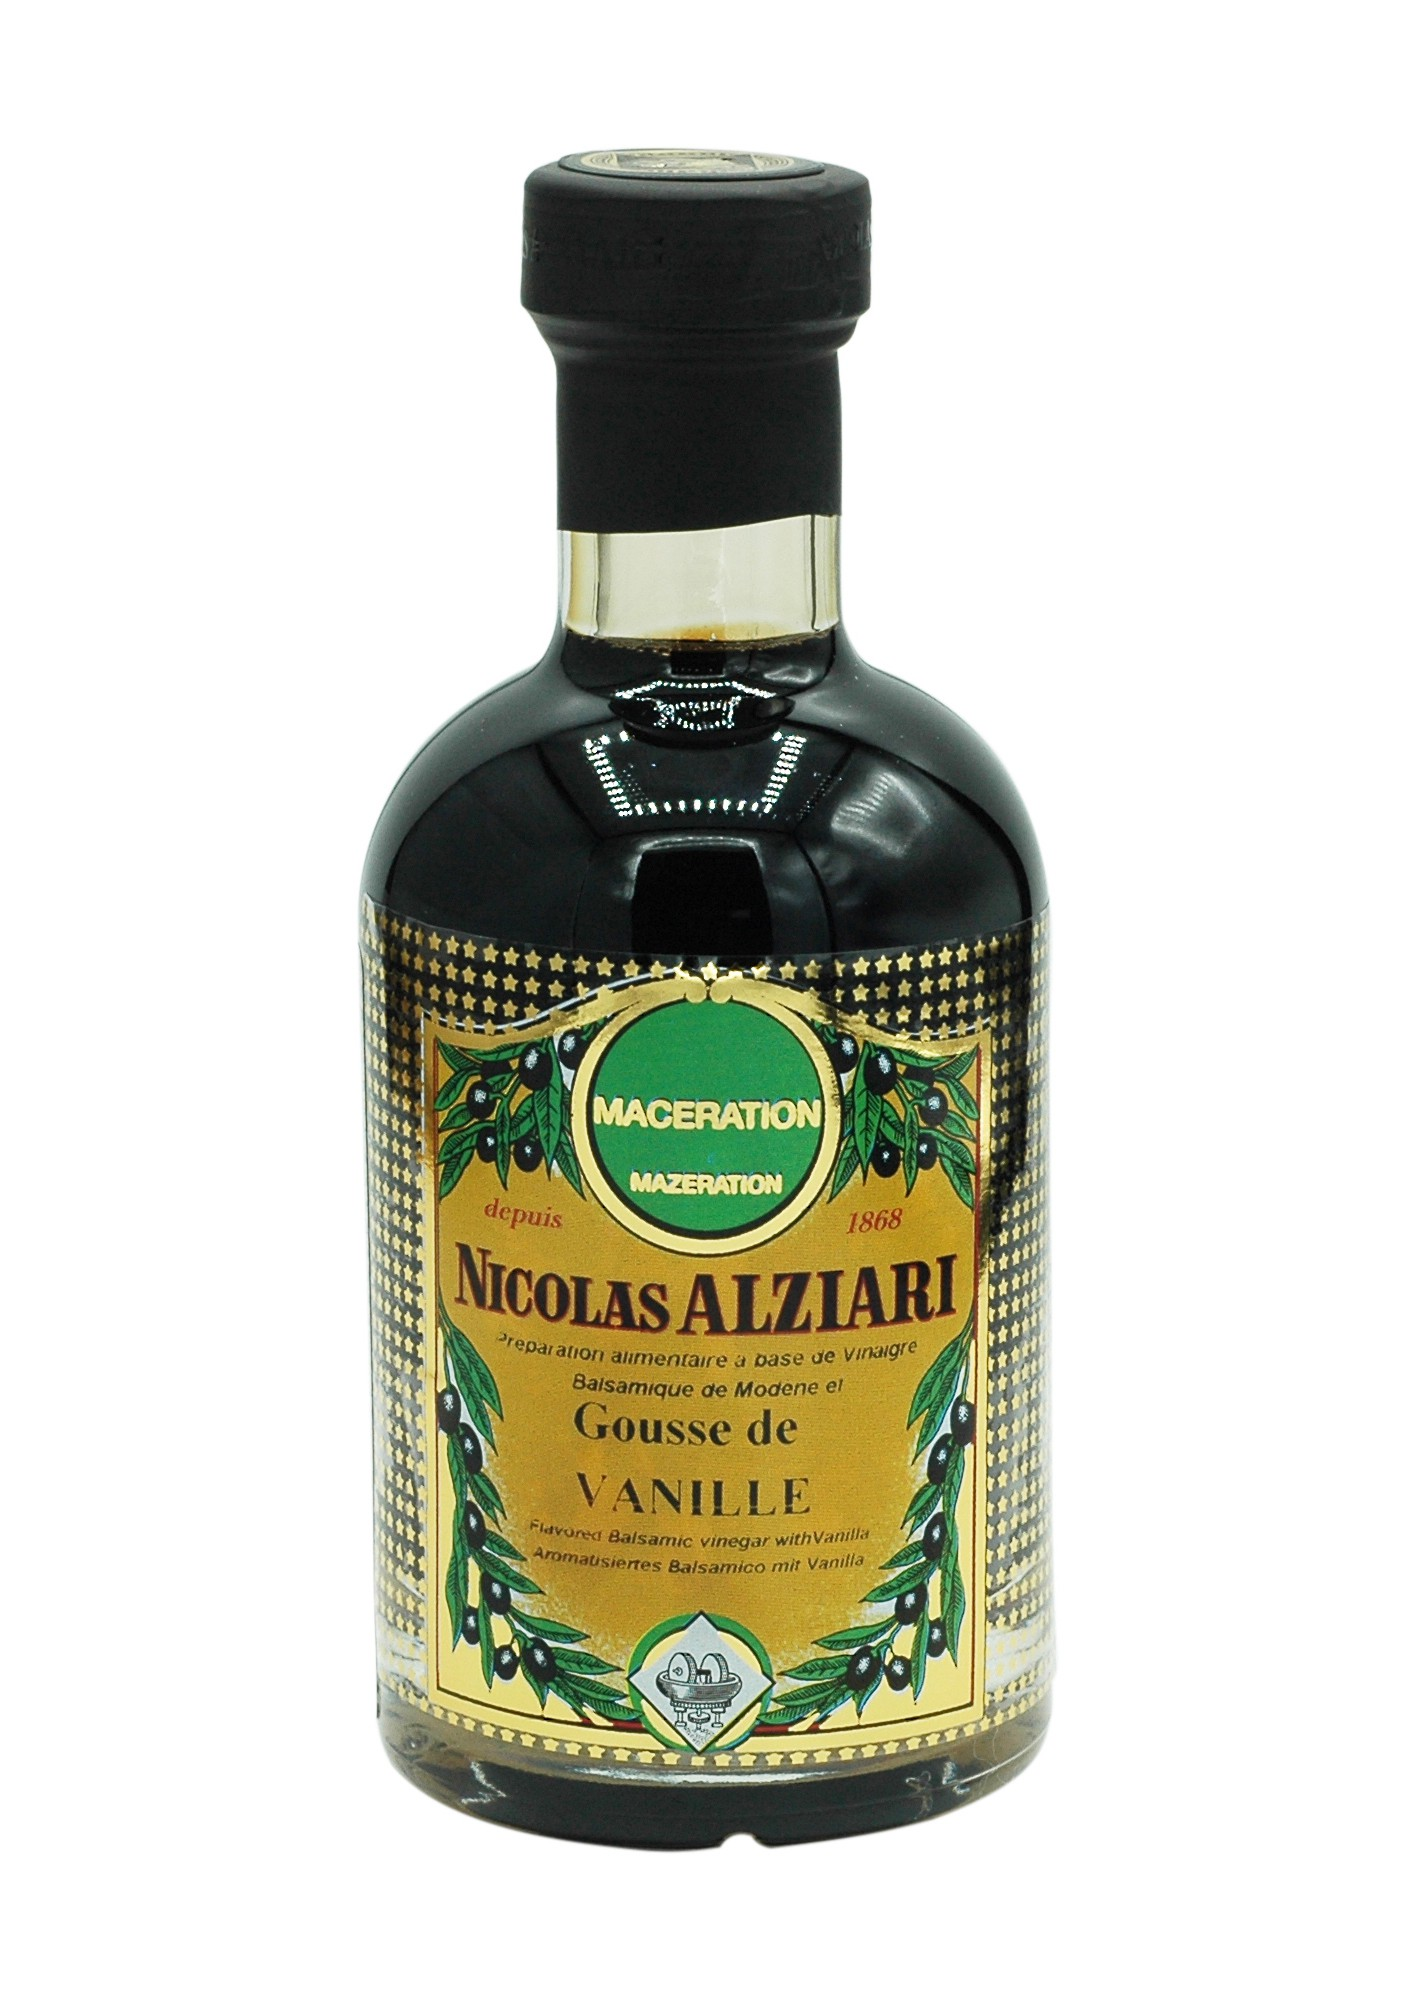 Balsamic vinegar with vanilla 200 ml